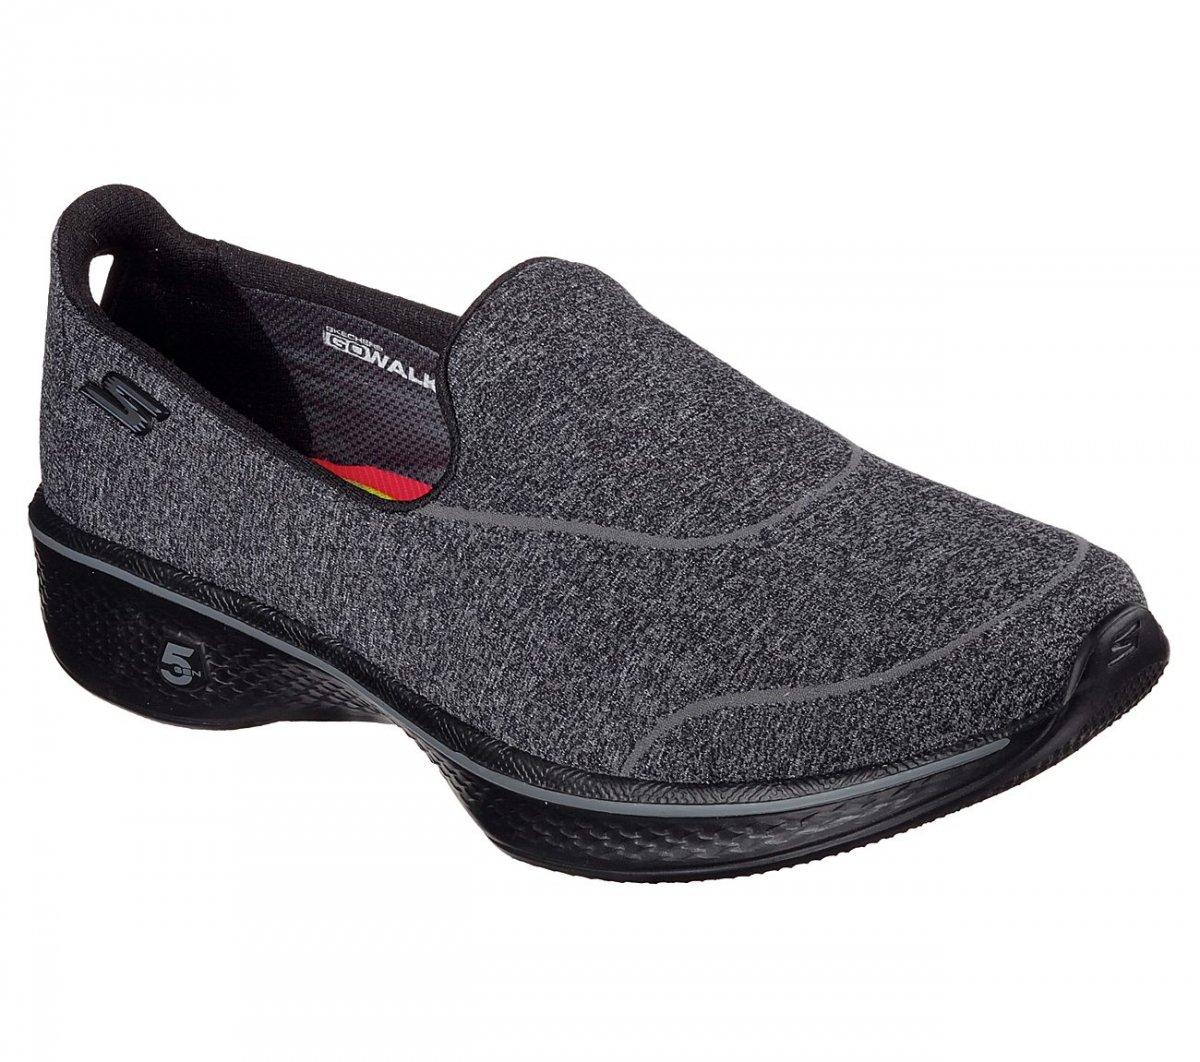 9c08d2455 Bizz Store - Tênis Feminino Skechers Go Walk 4 Super Sock